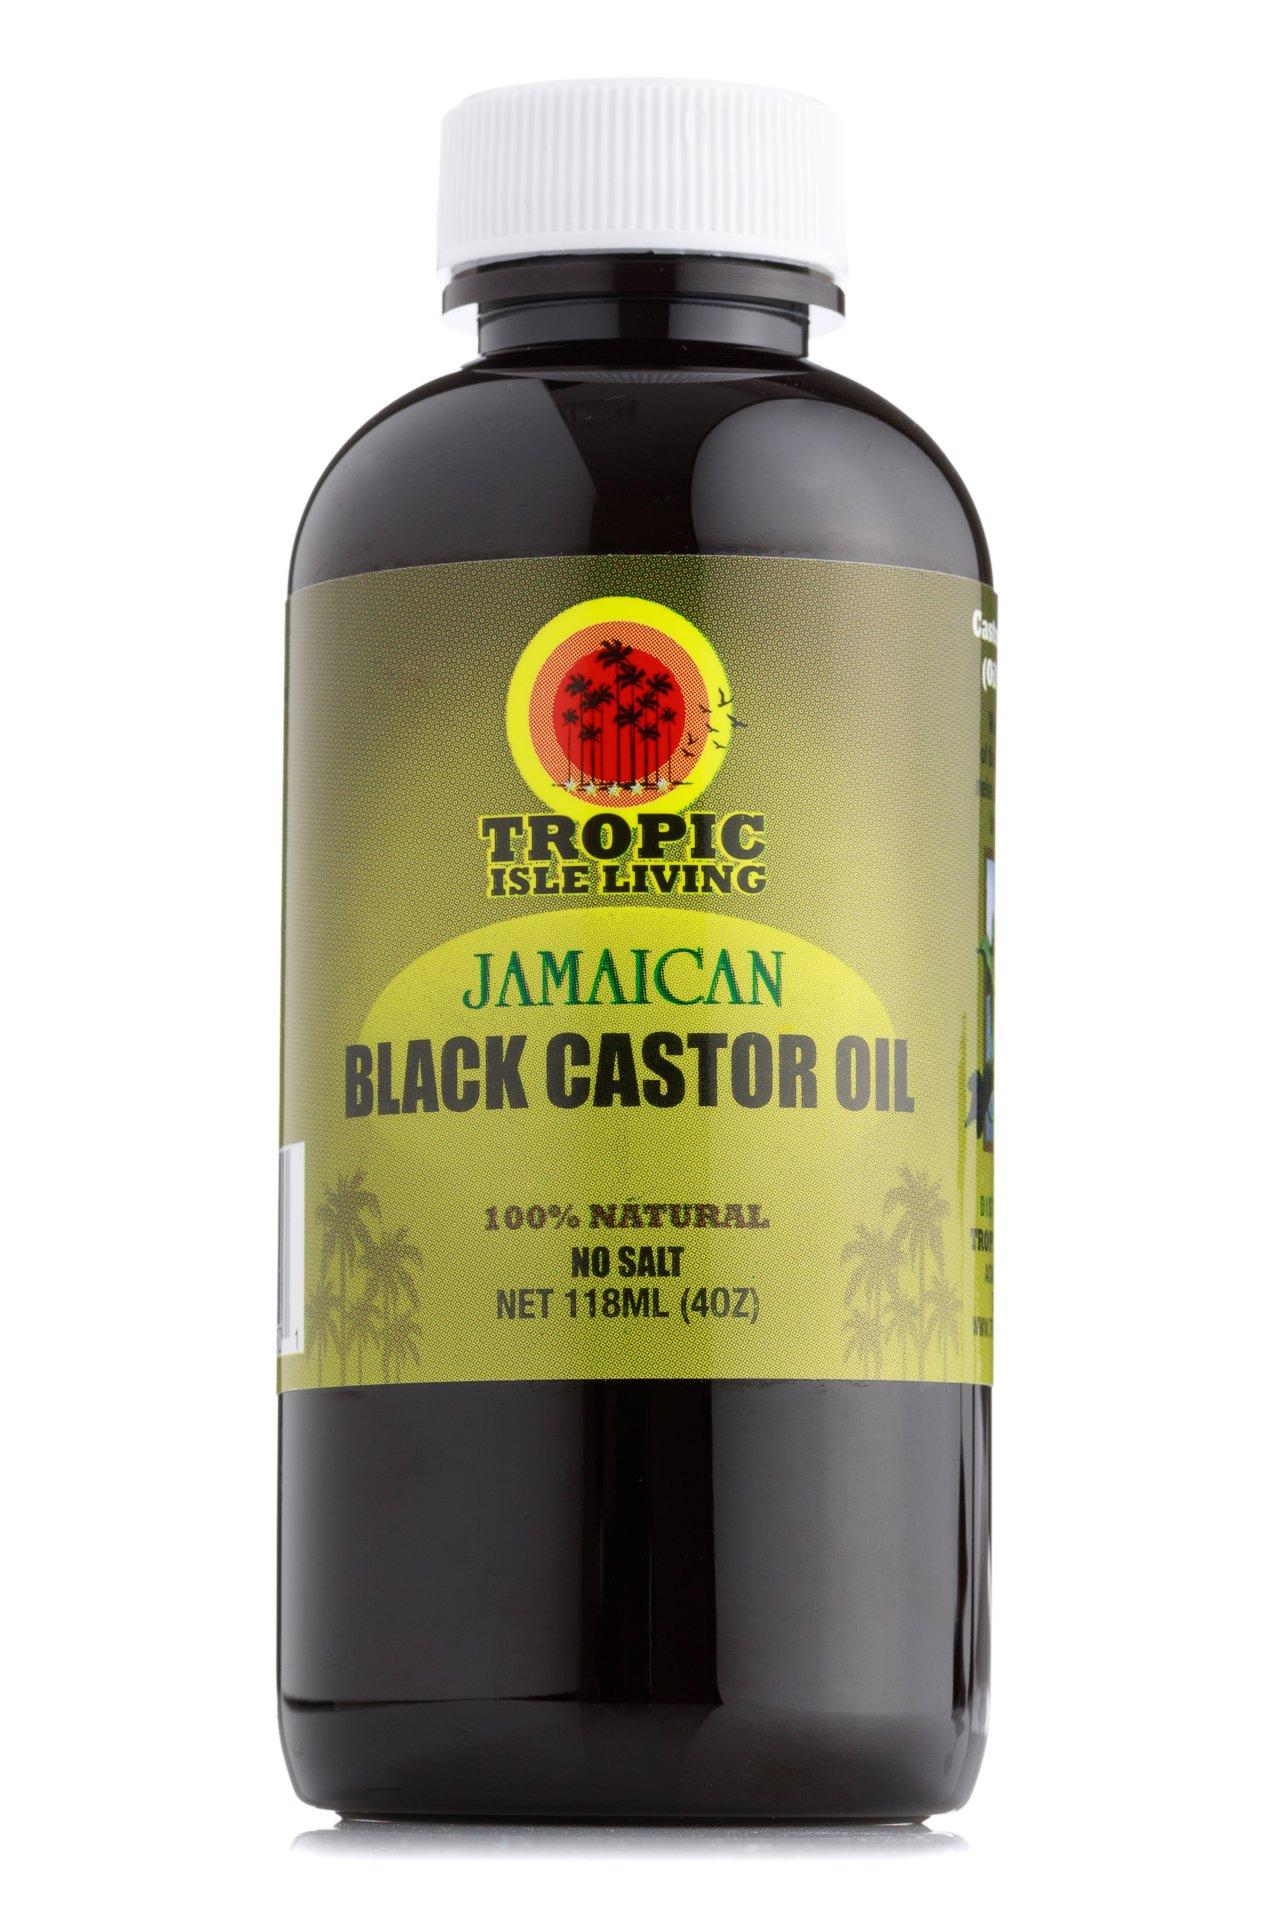 Tropic Isle Living- Jamaican Black Castor Oil-4oz